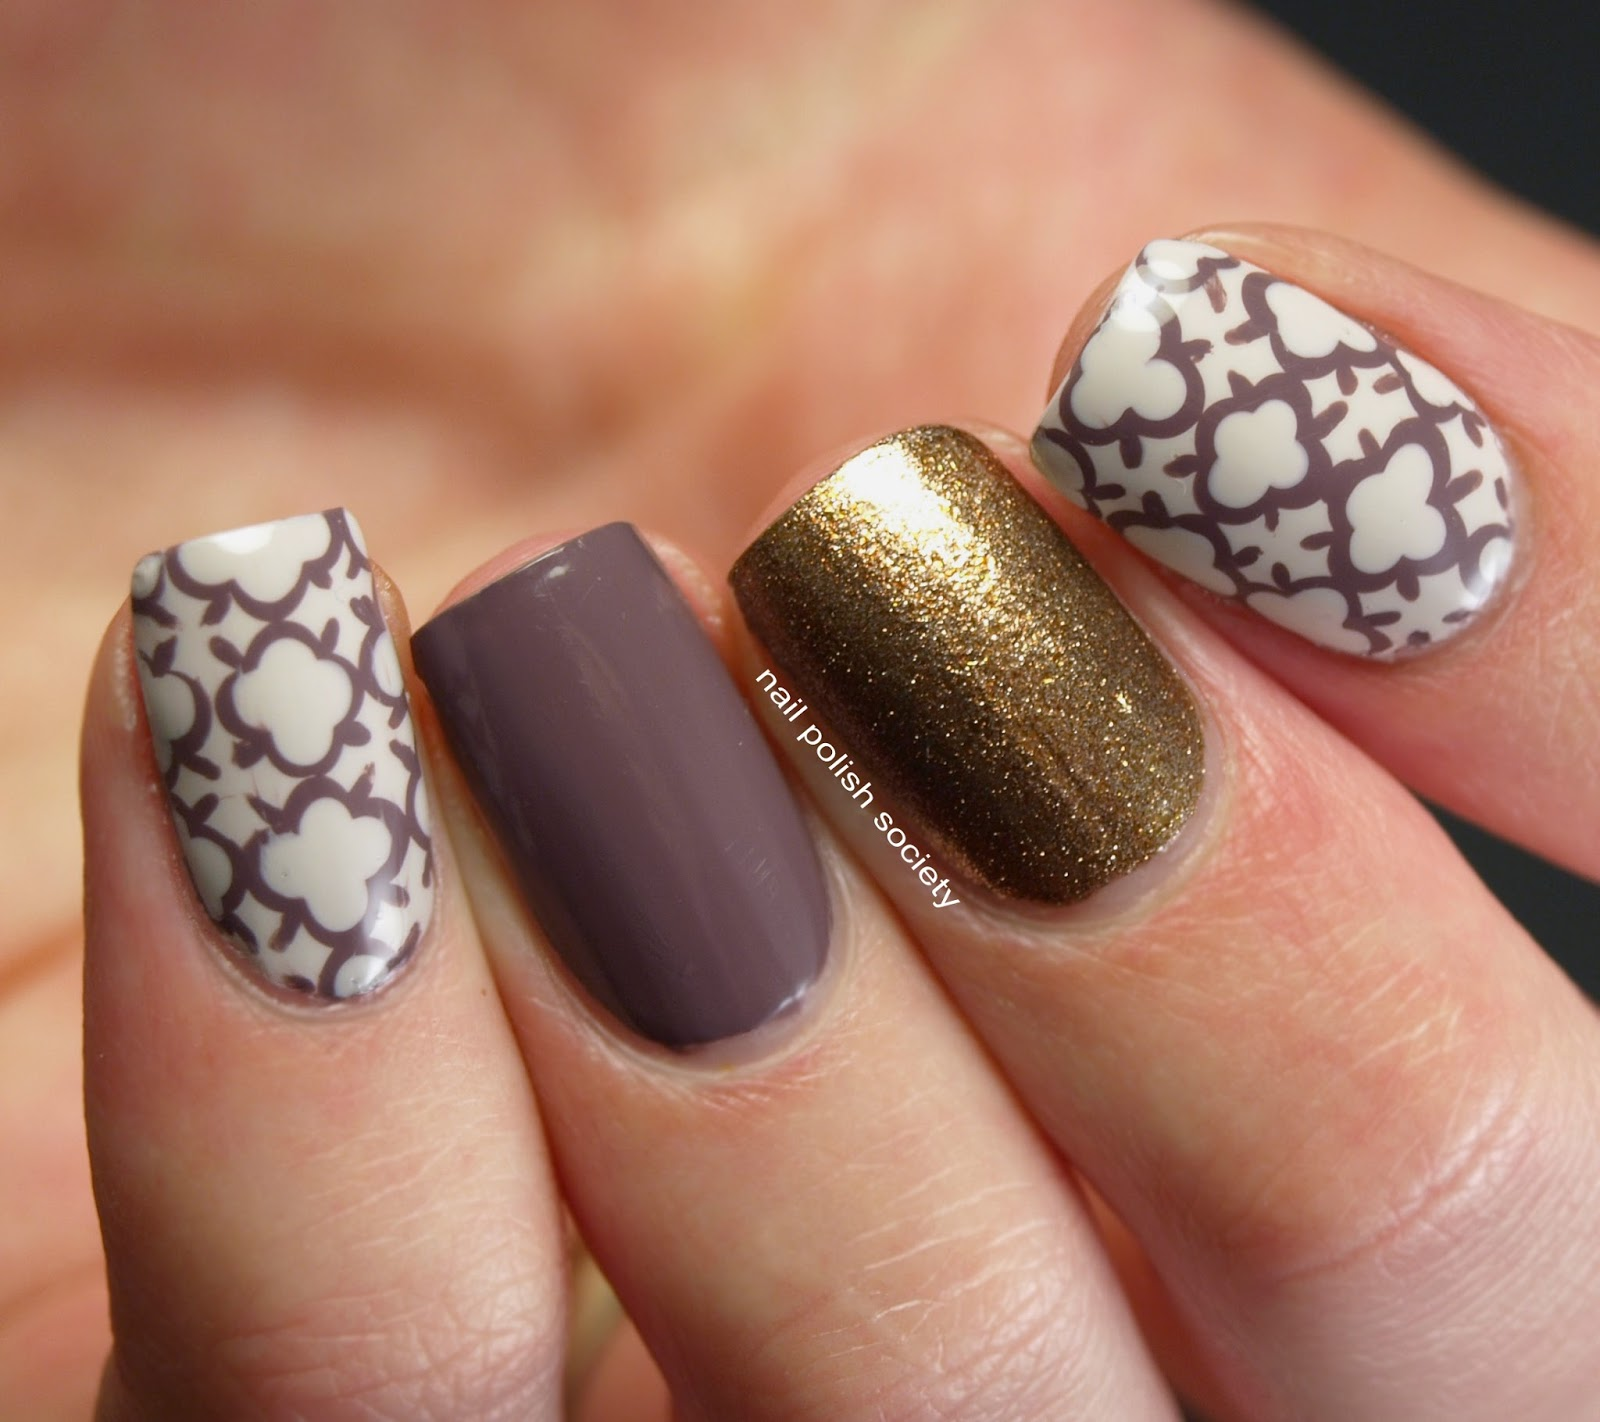 Tri-color nails